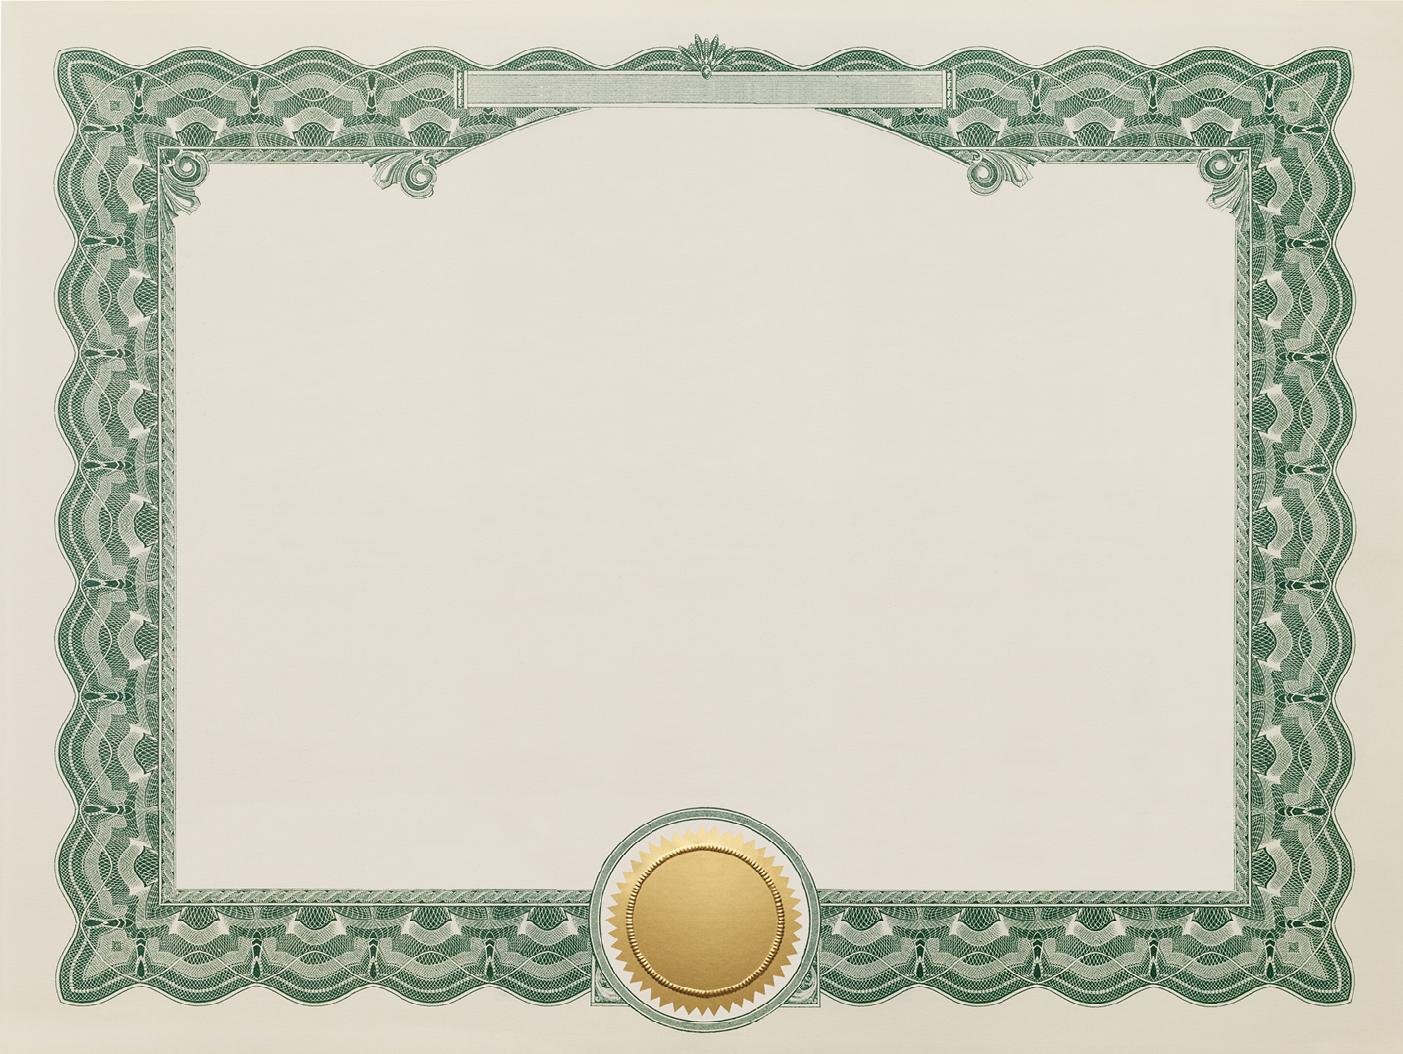 congratulation templates word